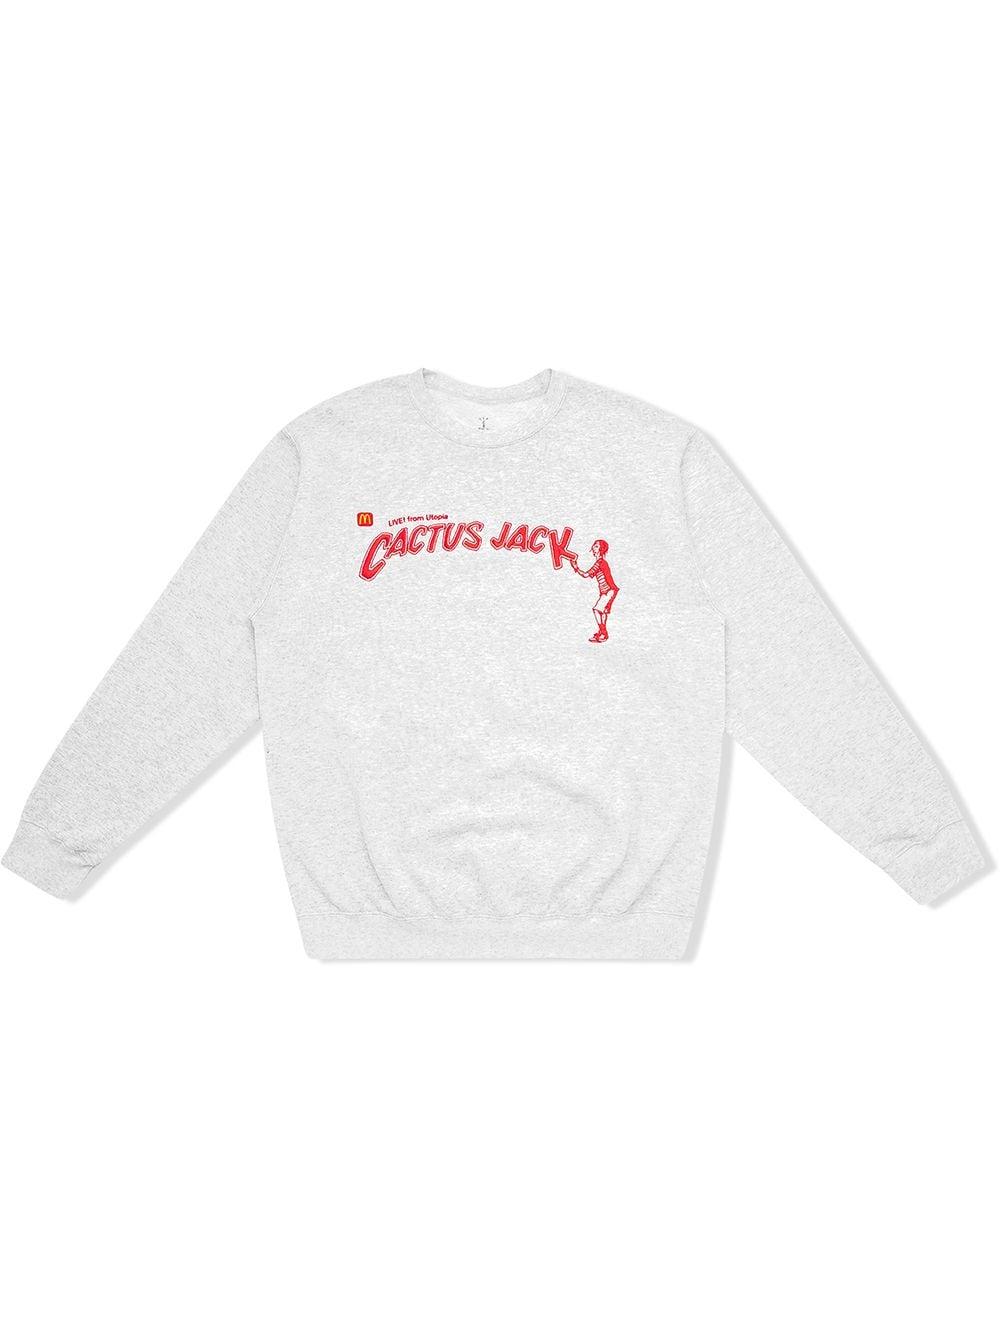 Travis Scott Astroworld x McDonald's Cactus Jack Spelling Sweatshirt - Grau